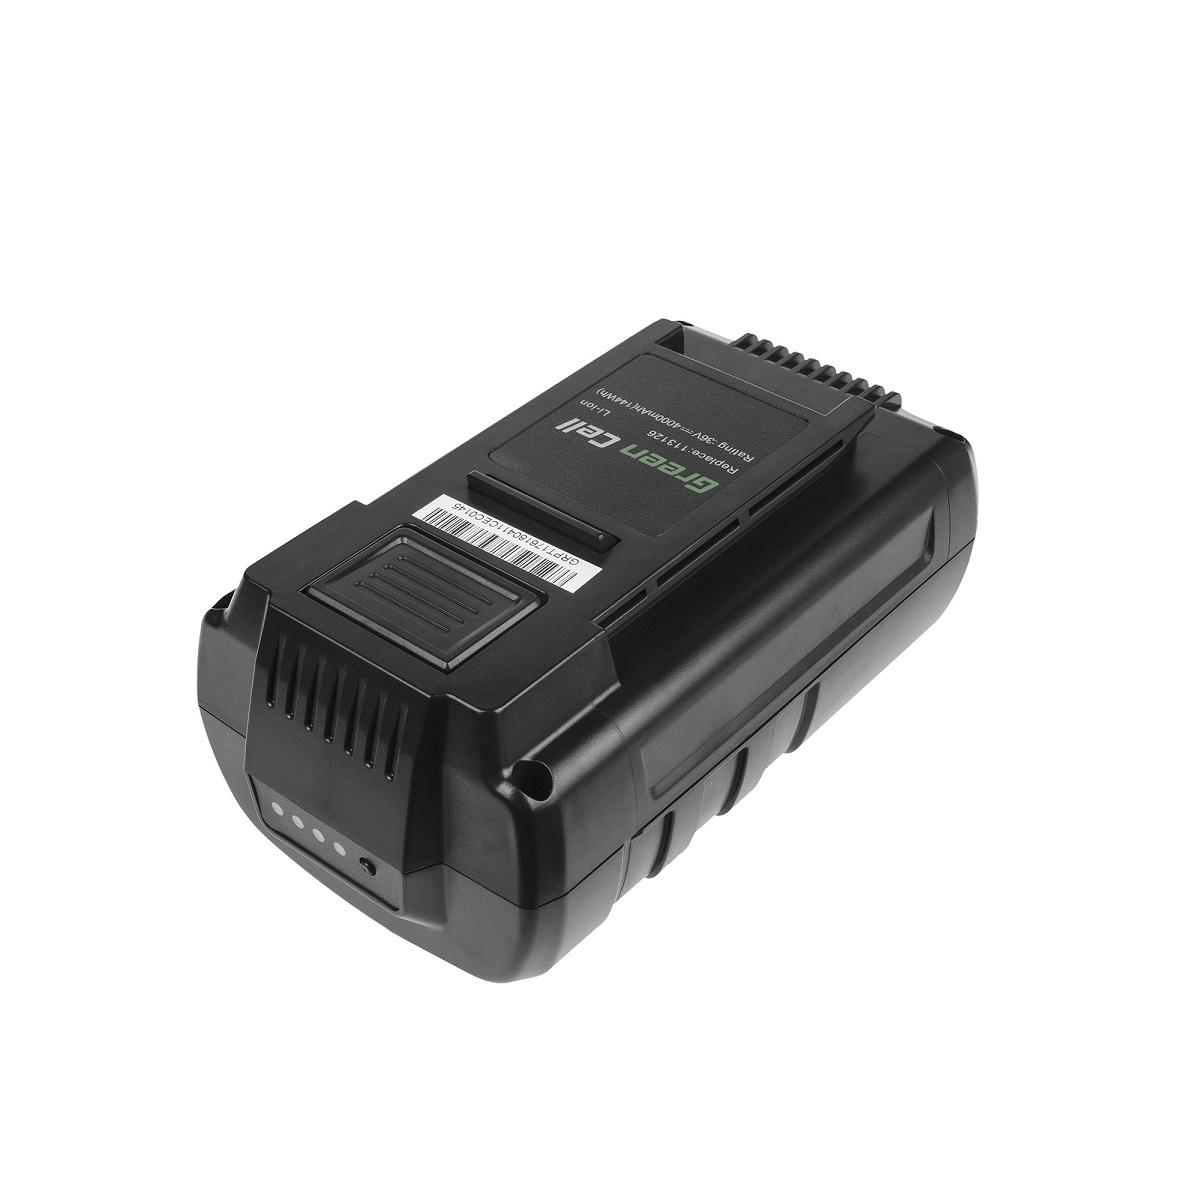 Akku für AL-KO EnergyFlex (113280) 4000mah 36V(Ersatz)